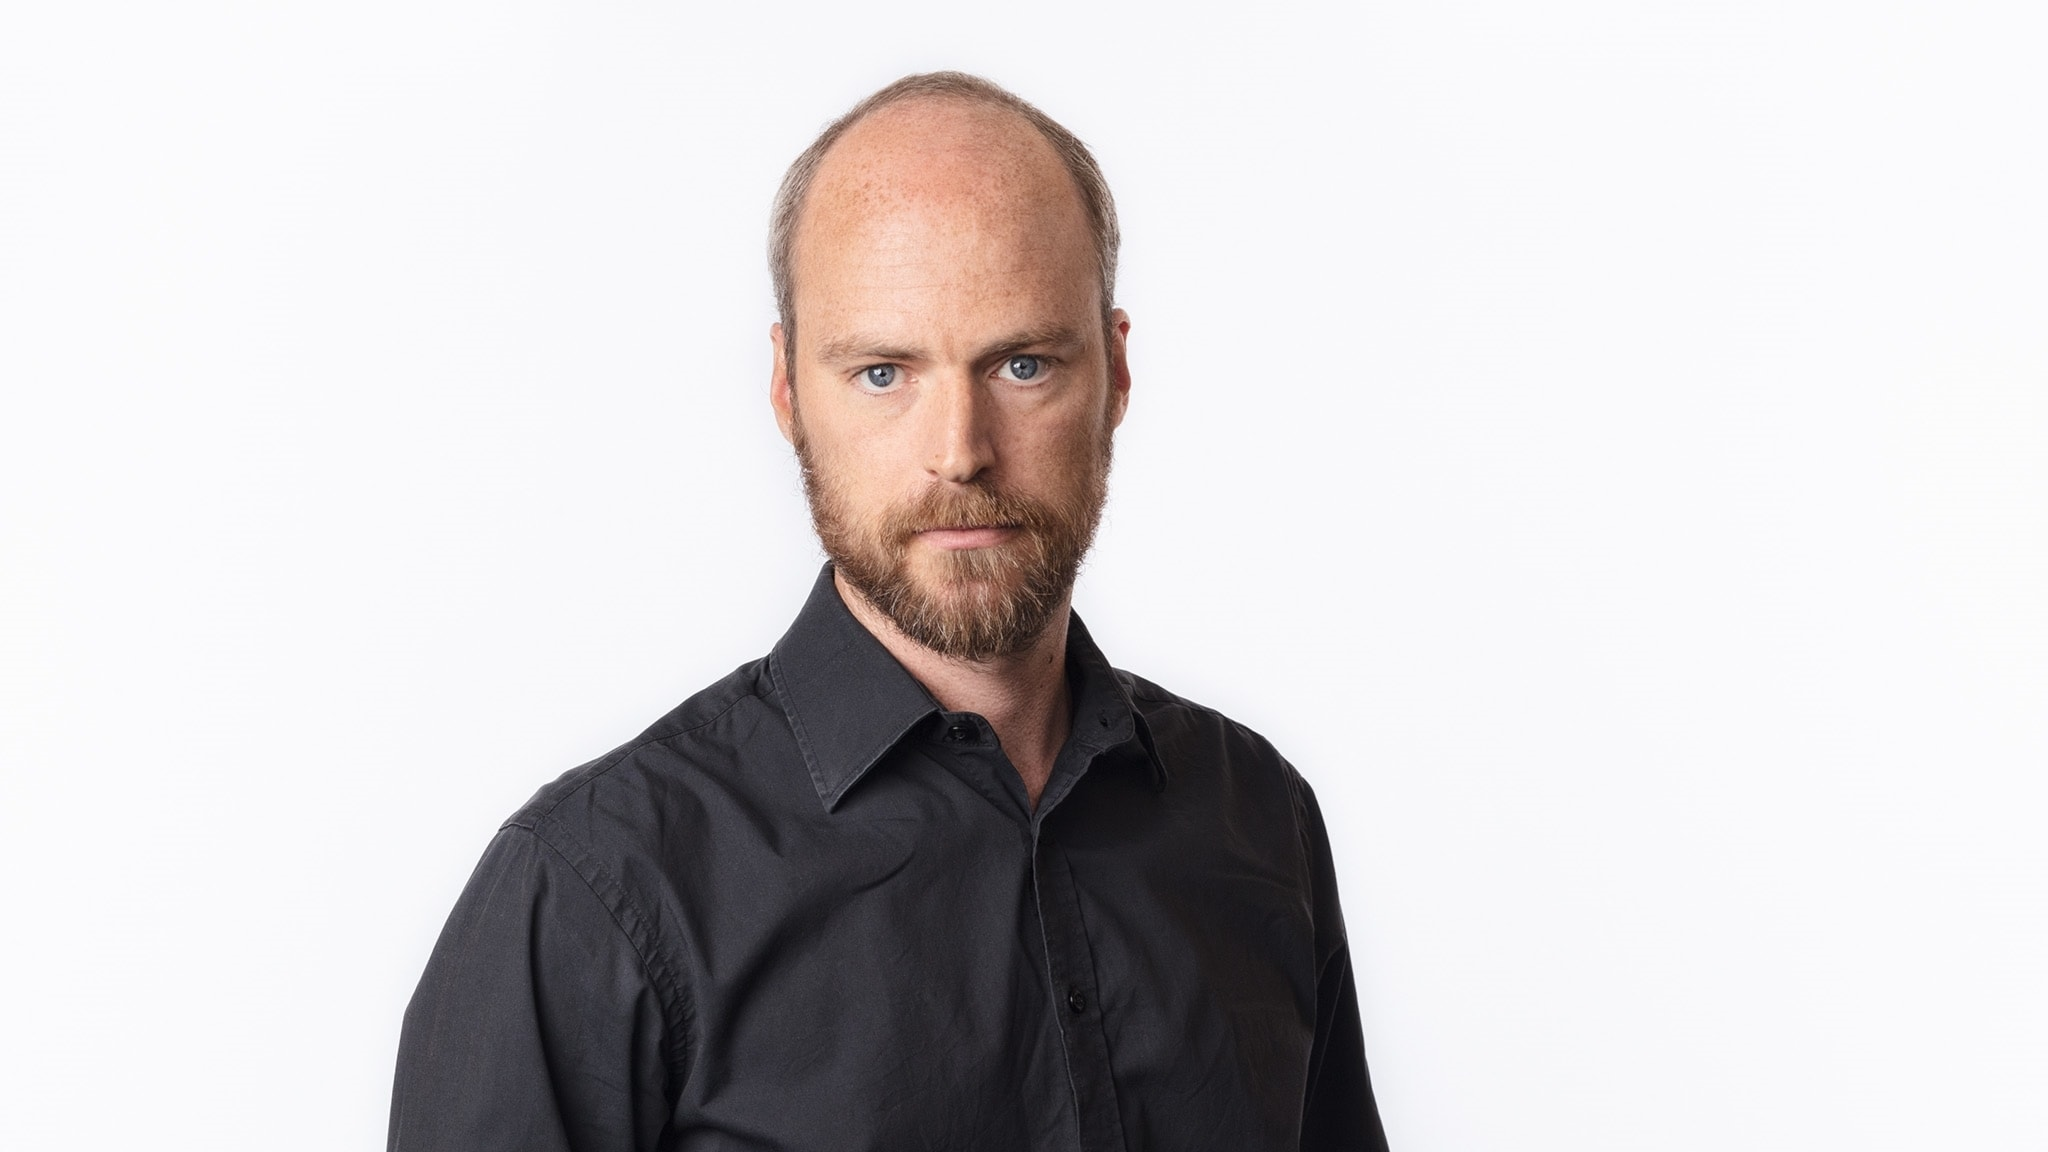 Skoputsaren och politiken: Samuel Larsson, Addis Abeba